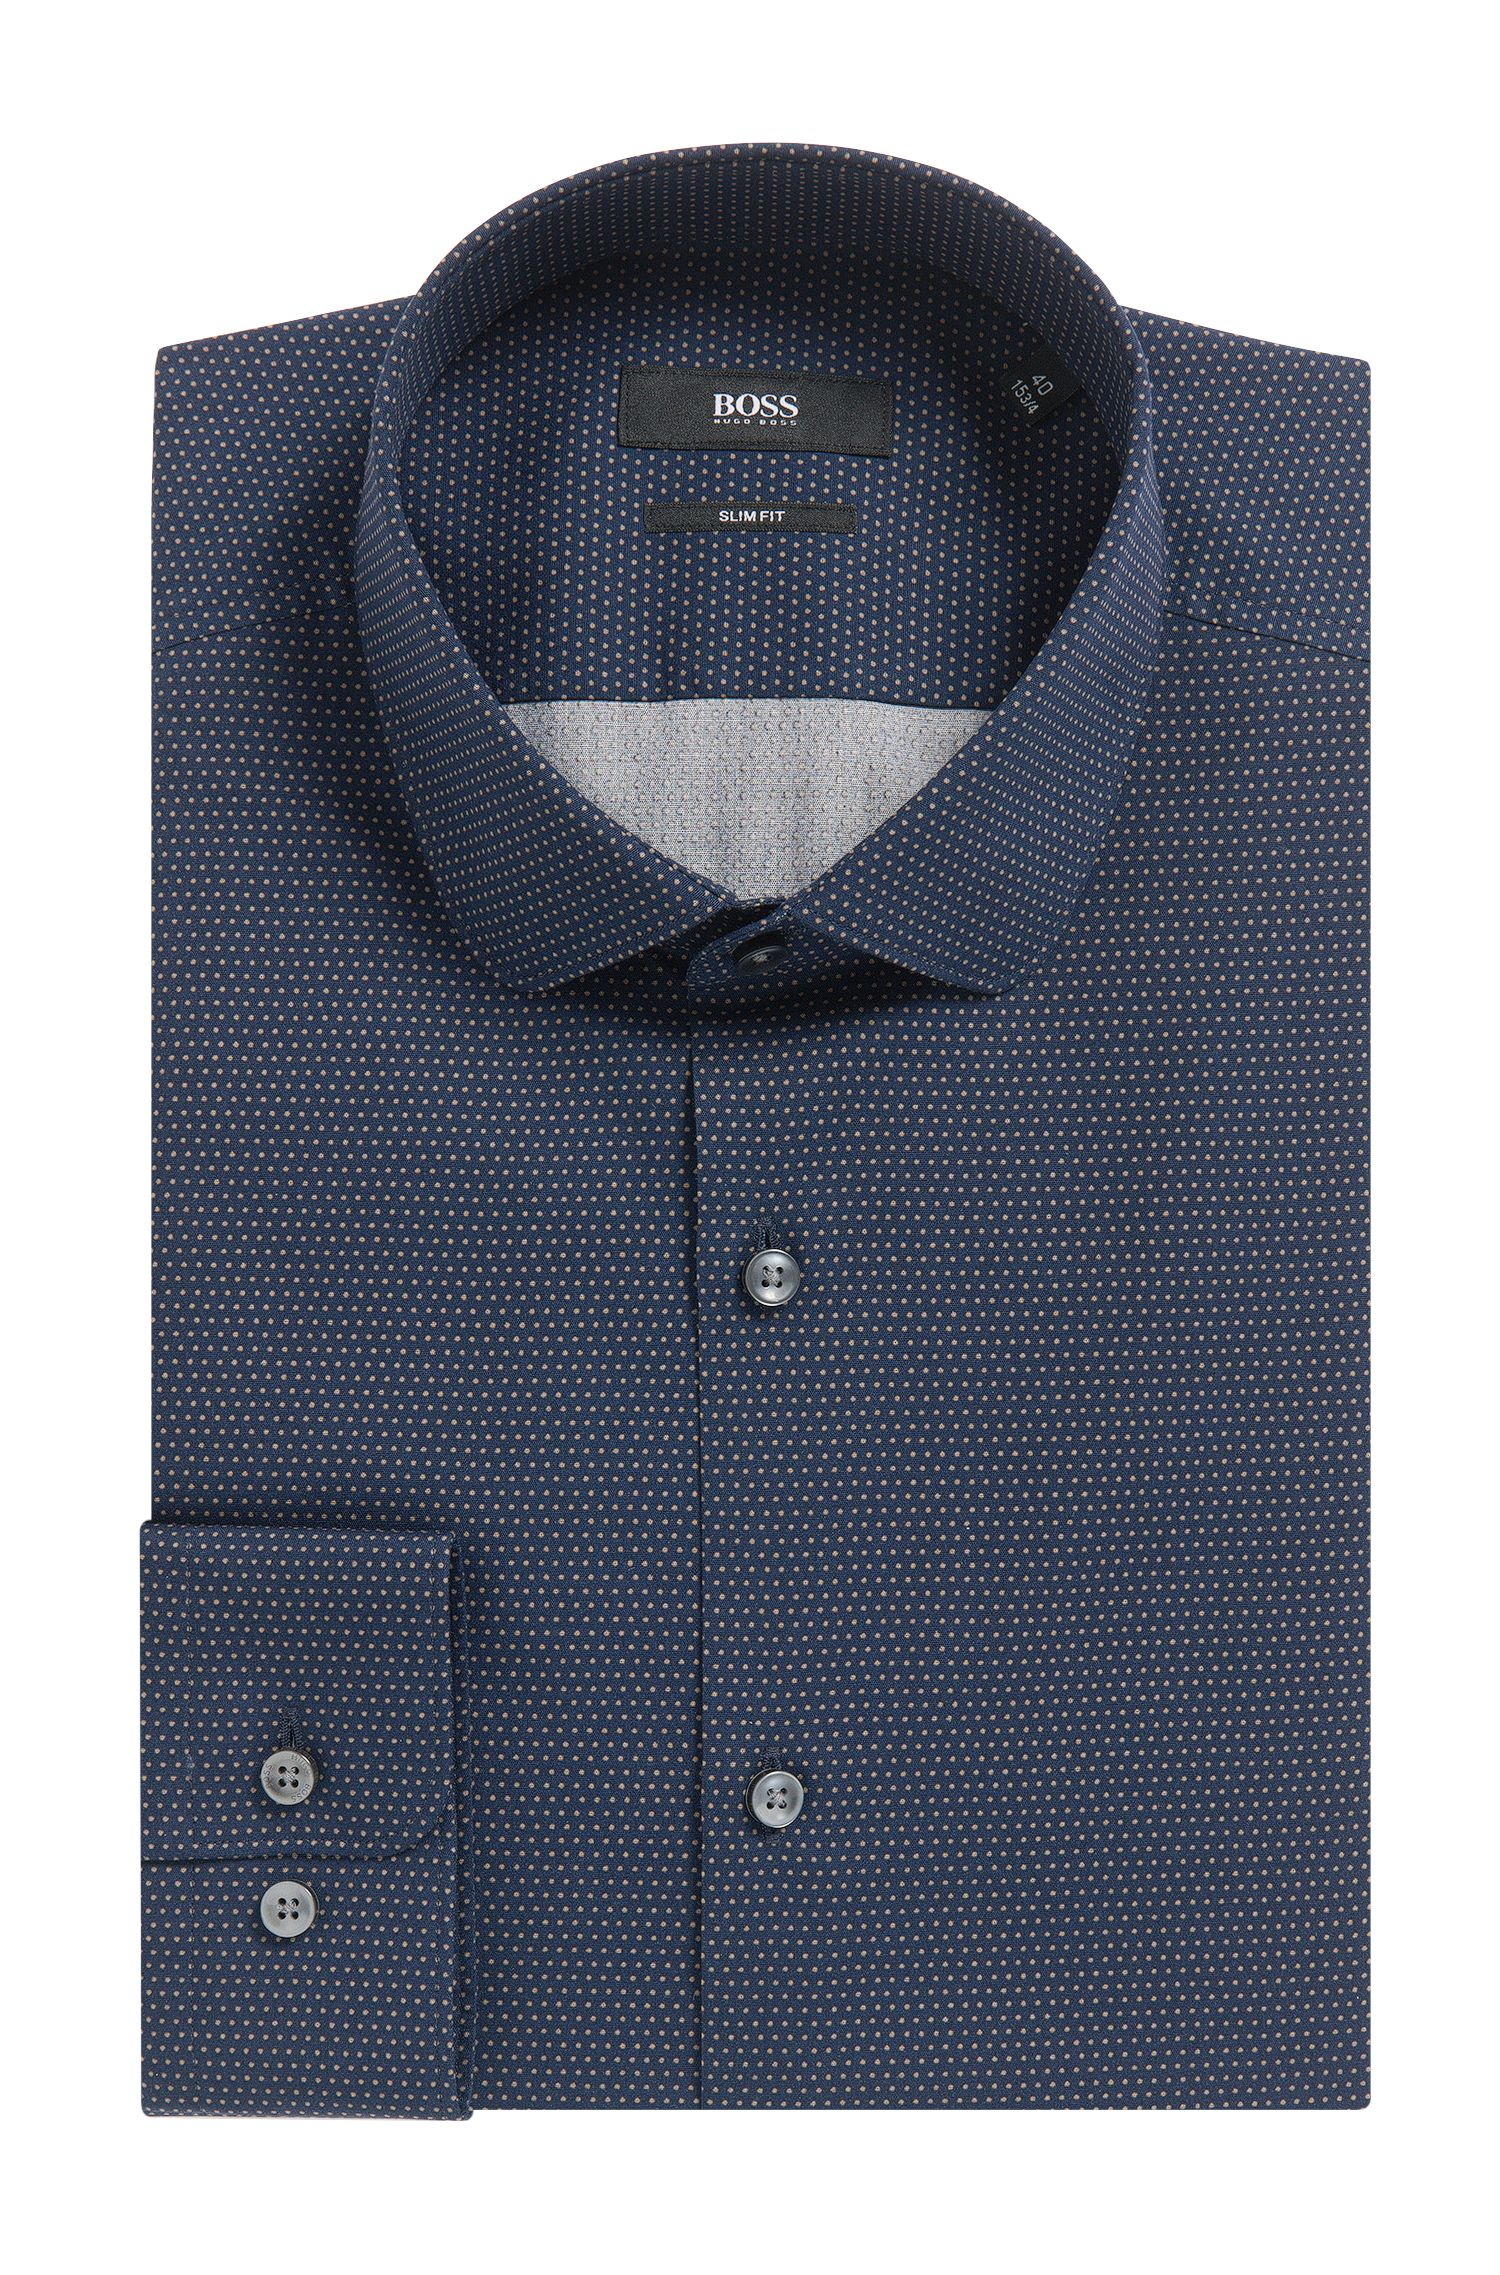 Pindot Cotton Poplin Dress Shirt, Slim Fit | Joshua